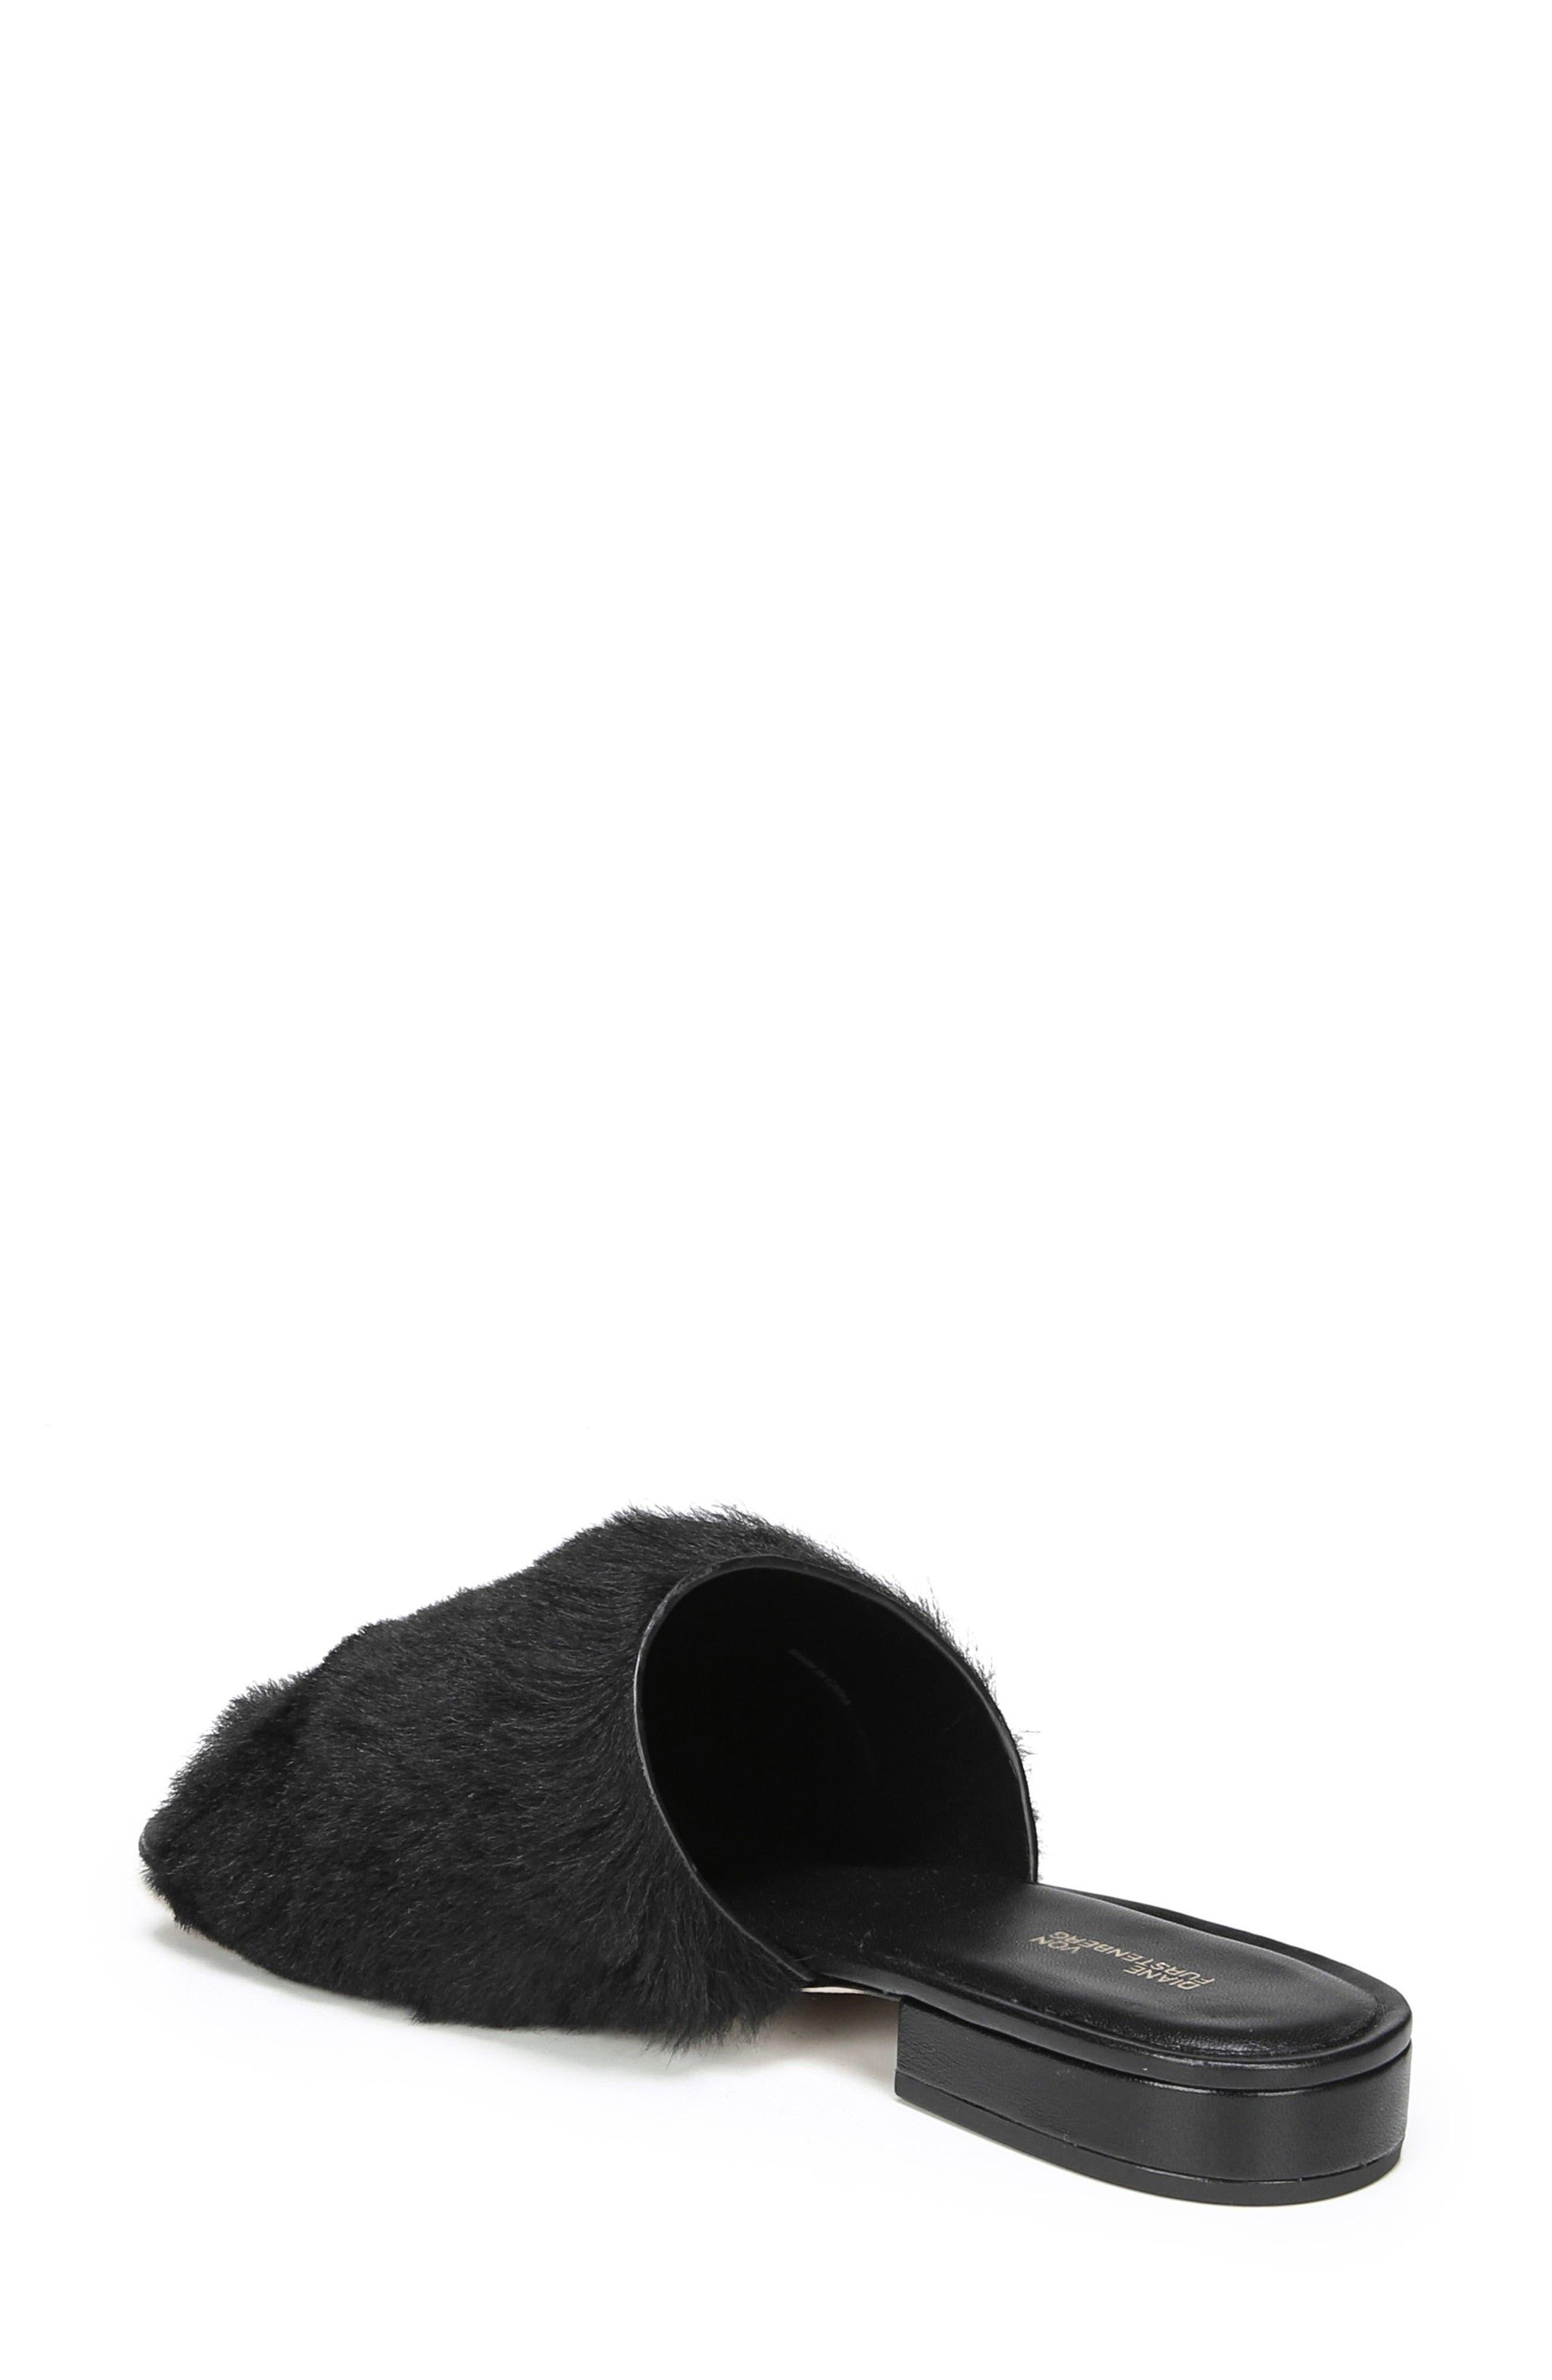 Santi Genuine Shearling Slide Sandal,                             Alternate thumbnail 2, color,                             Black